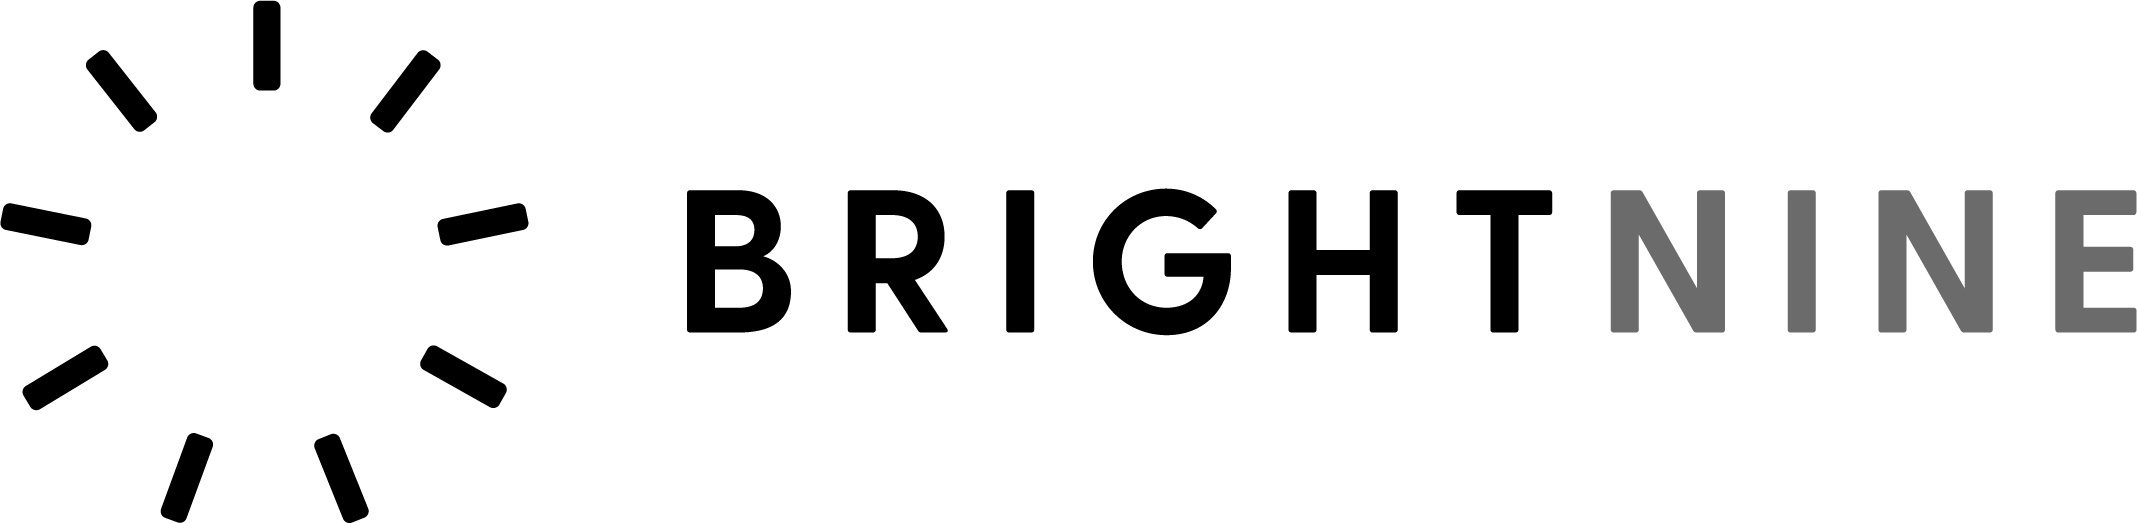 brightnine-logo-horizontal-black.jpg